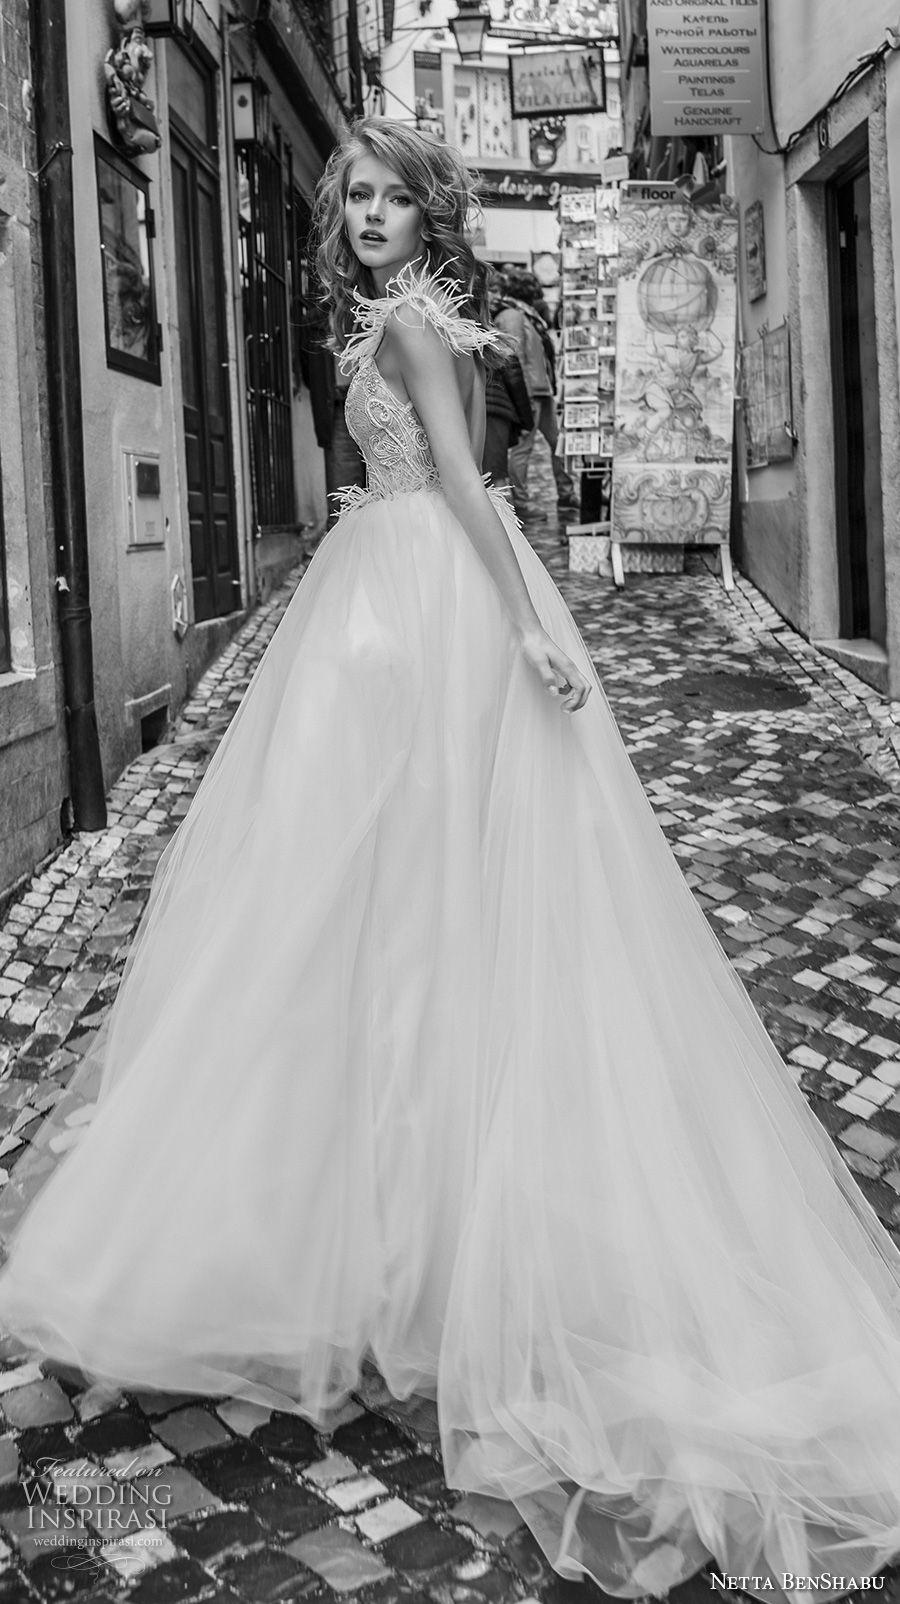 netta benshabu 2017 bridal cap sleeves sweetheart neckline heavily embellished bodice princess ball gown wedding dress open back chapel train (19) sdv